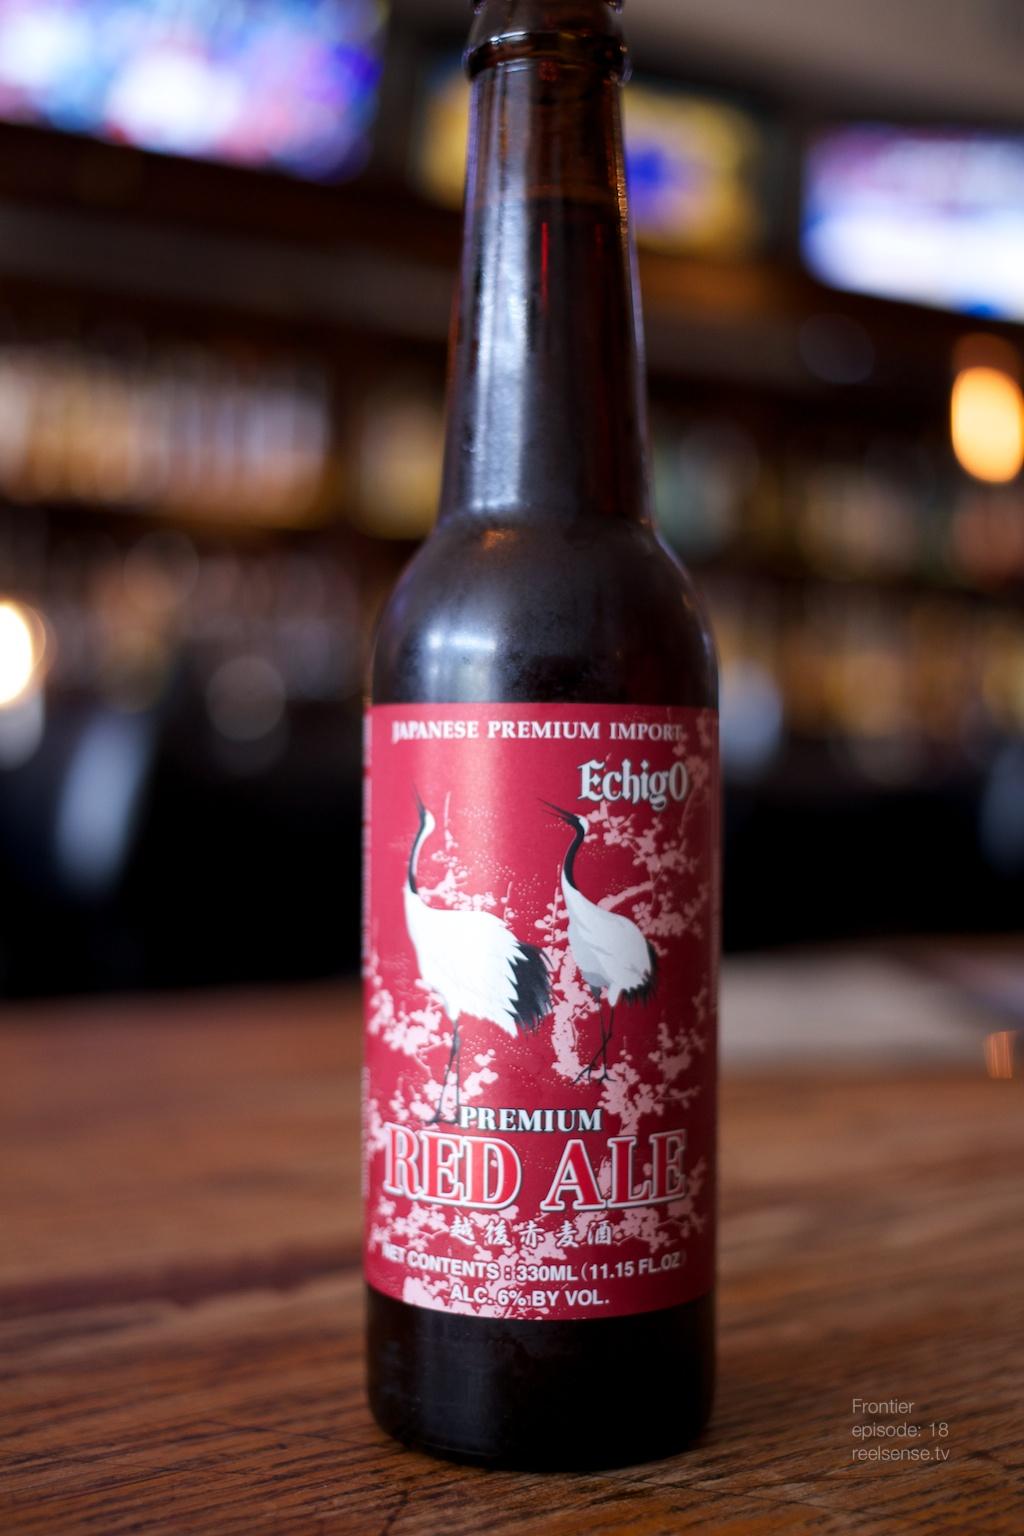 Little Tokyo - Far bar - Echigo Red Ale Beer